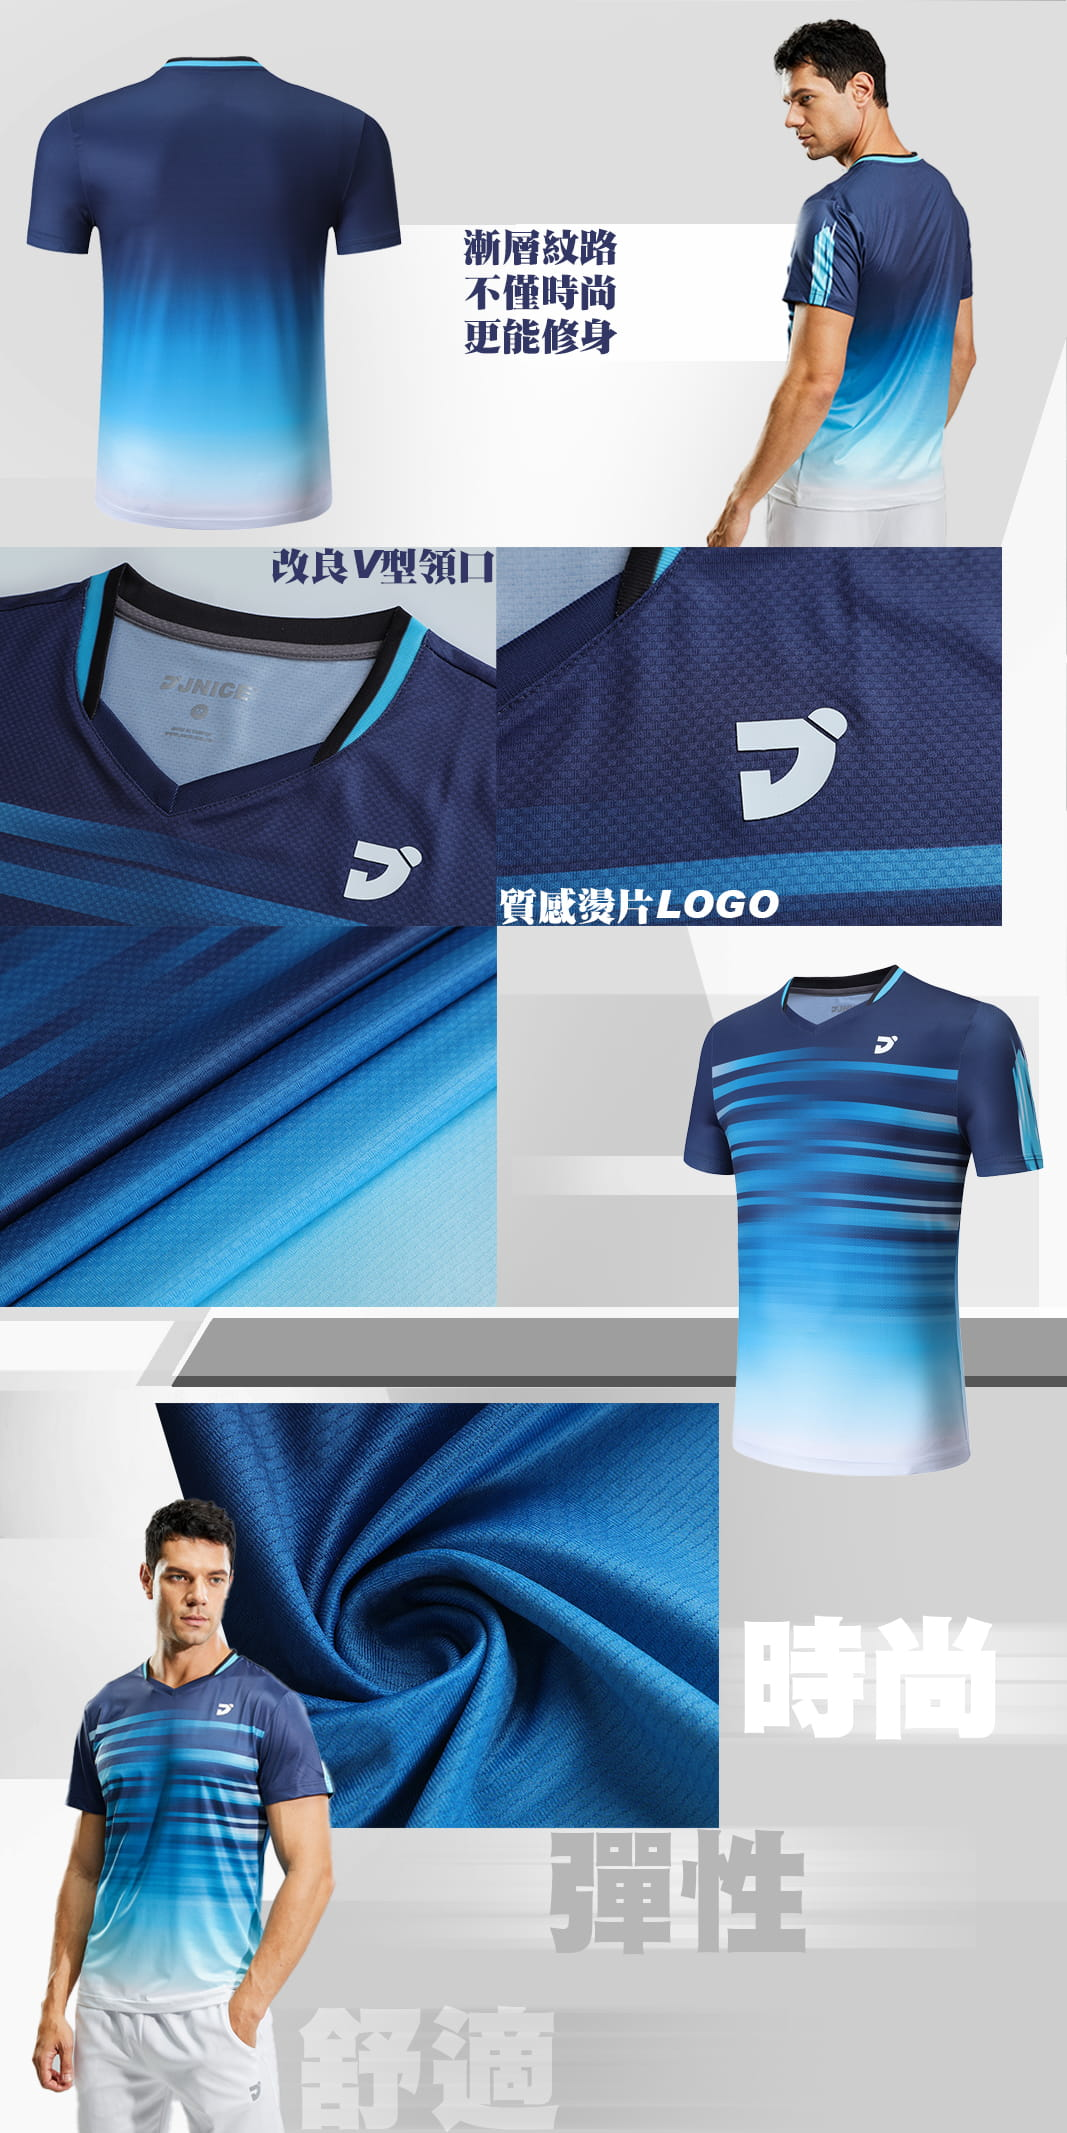 【JNICE】簡約橫紋競技賽服-漸層藍 2